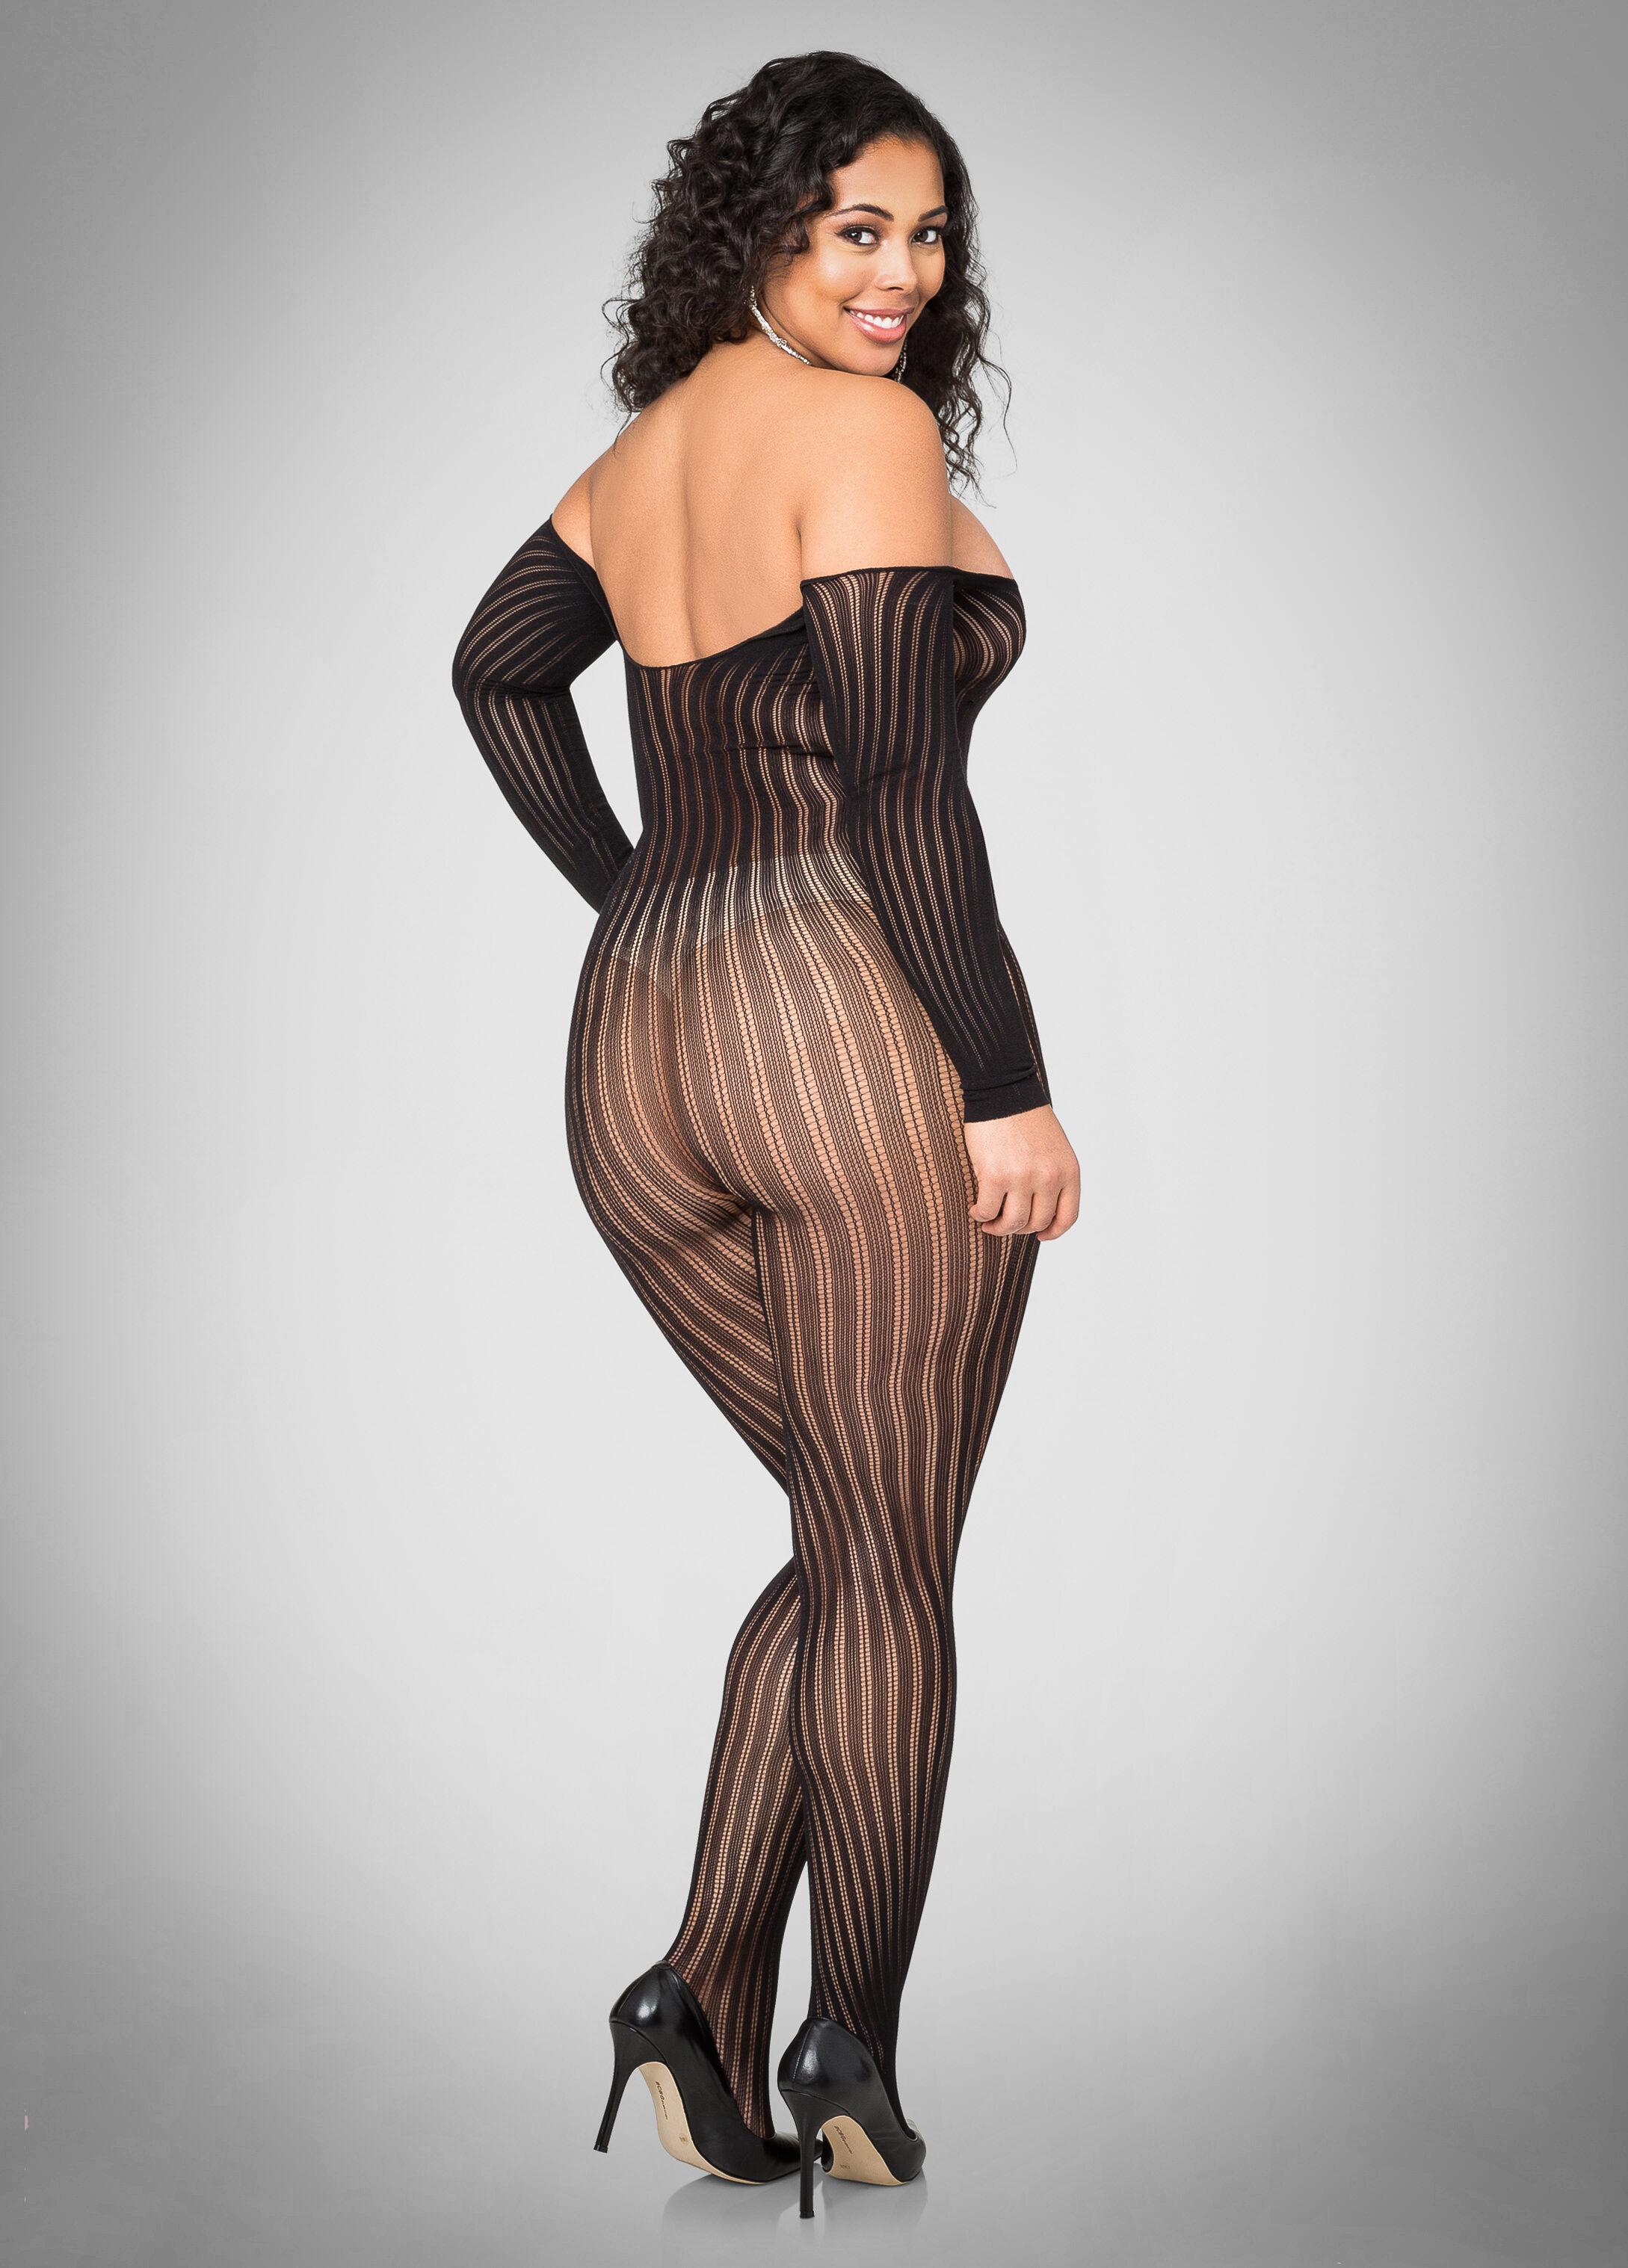 Sheer Off Shoulder Lingerie Bodysuit-Plus Size Lingerie ...